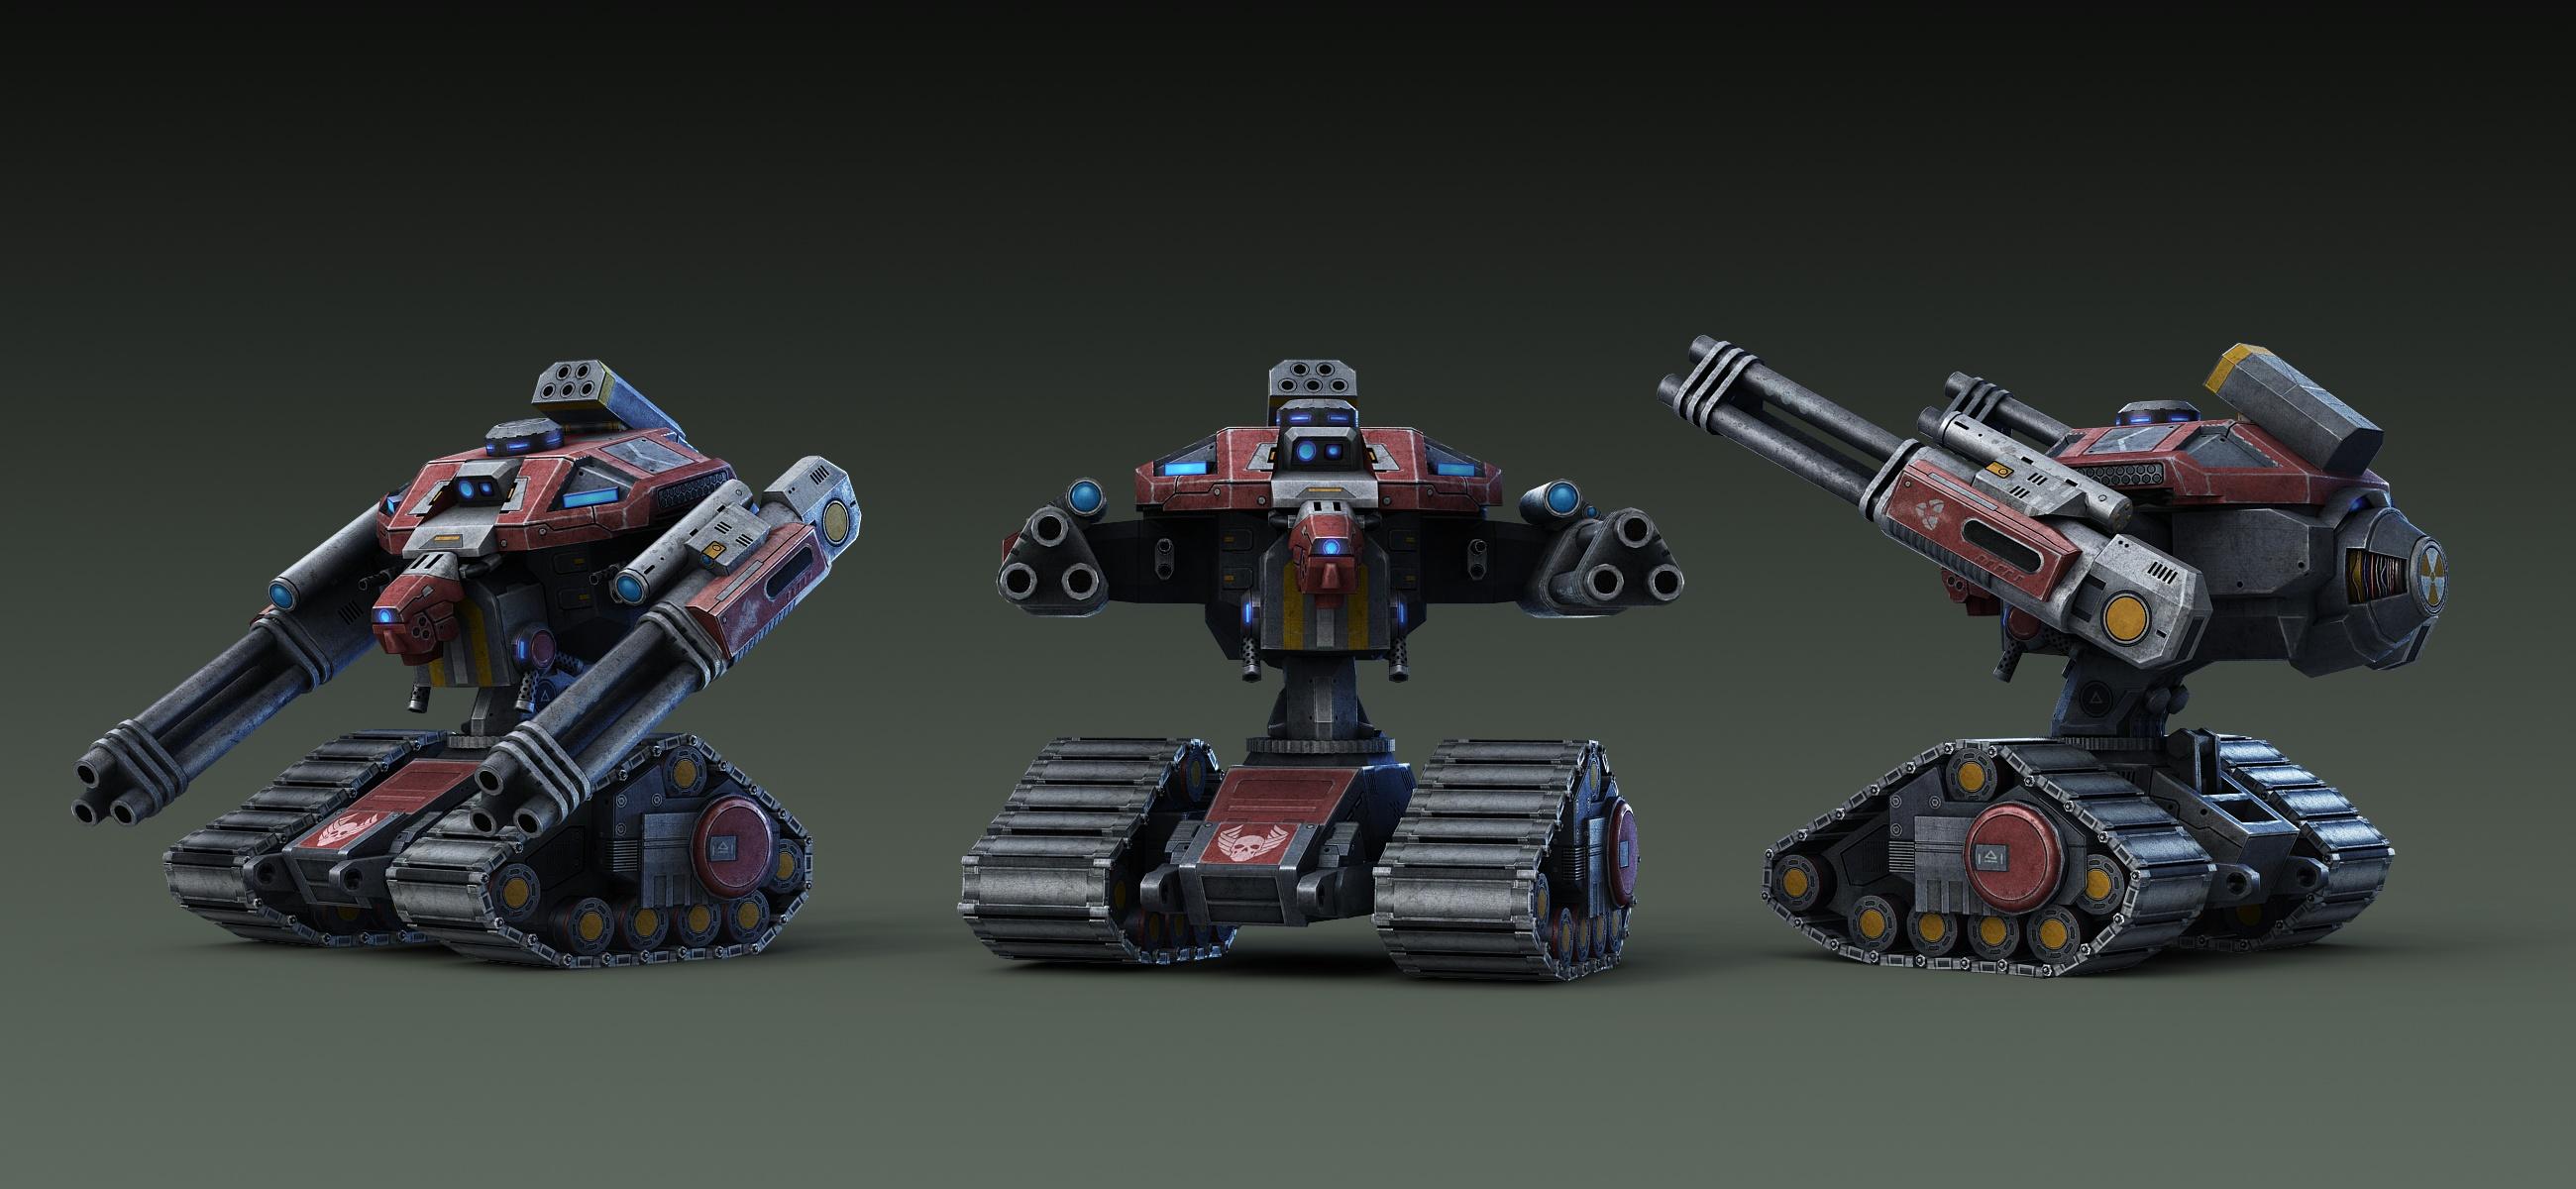 Terminator-Kingpin Partner Rendering 2